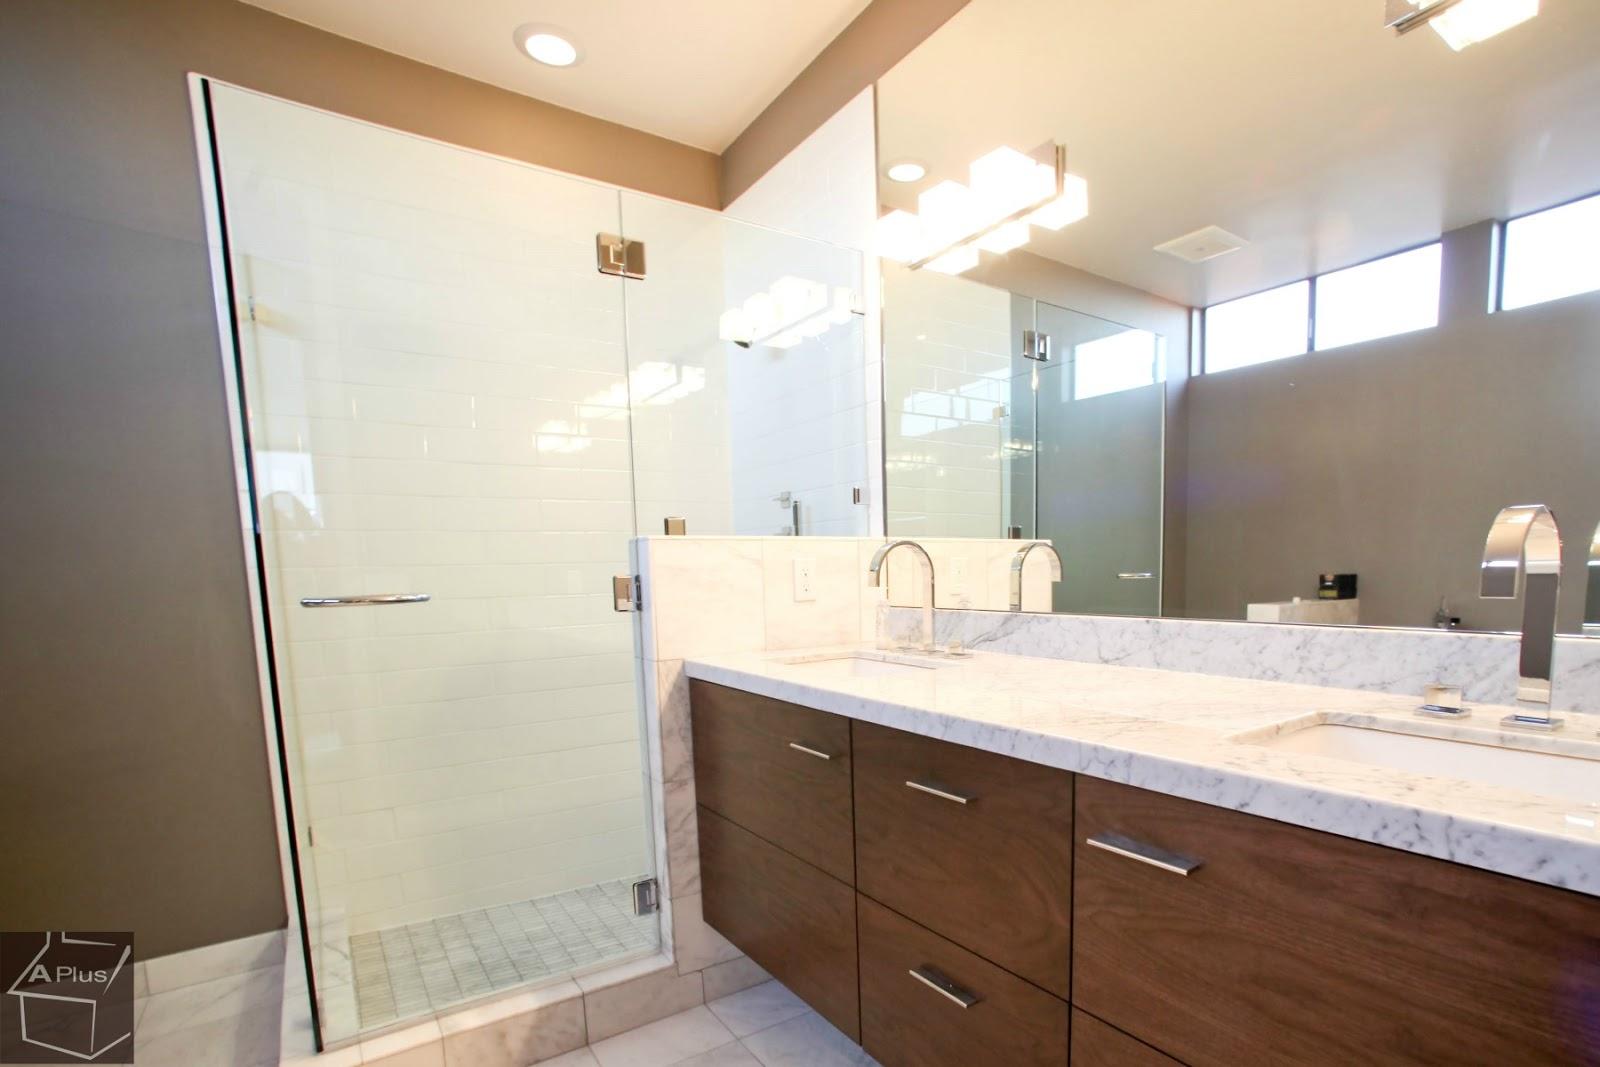 Newport Beach kitchen Remodel on bathroom painting, bathroom makeovers, bathroom showers, bathroom windows, bathroom renovation, bathroom plumbing, bathroom vanities, bathroom tubs, bathroom hardwood floors, bathroom countertops, bathroom design, bathroom decorating, bathroom remodels for small bathrooms, bathroom remodelers, bathroom installation, bathroom plans, bathroom flooring, bathroom paint, bathroom tile, bathroom upgrades,